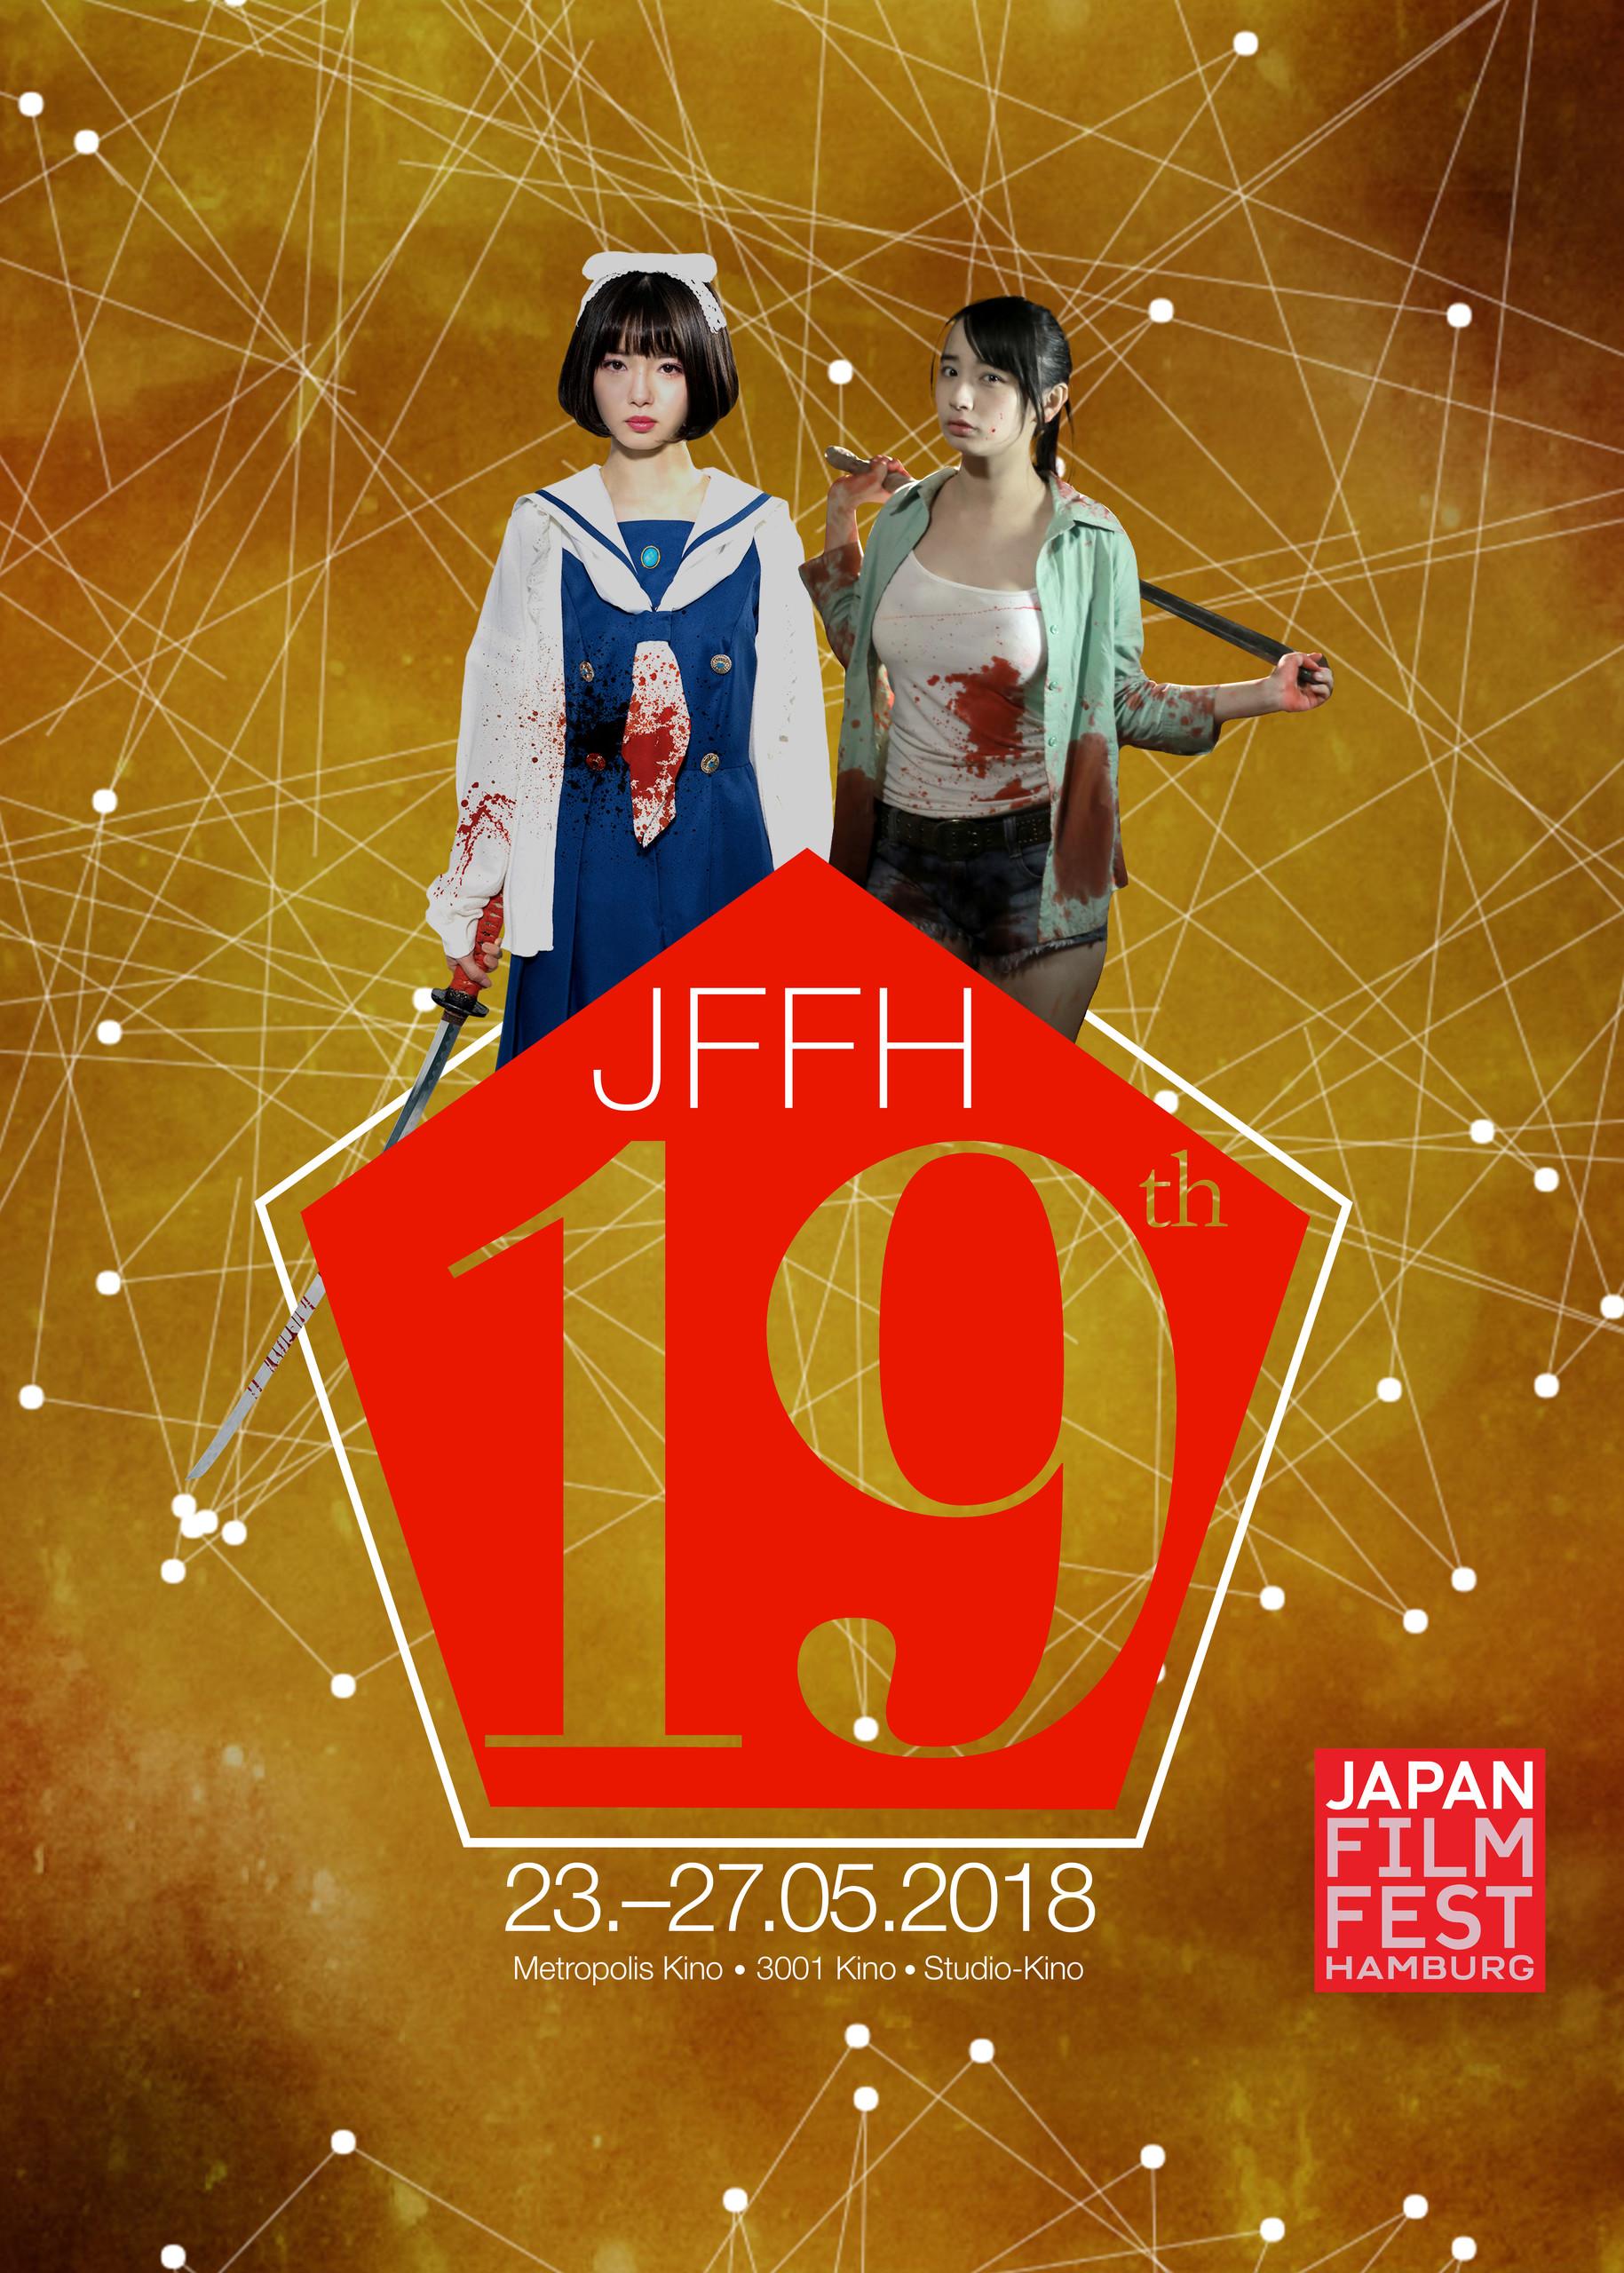 19. JFFH 2018